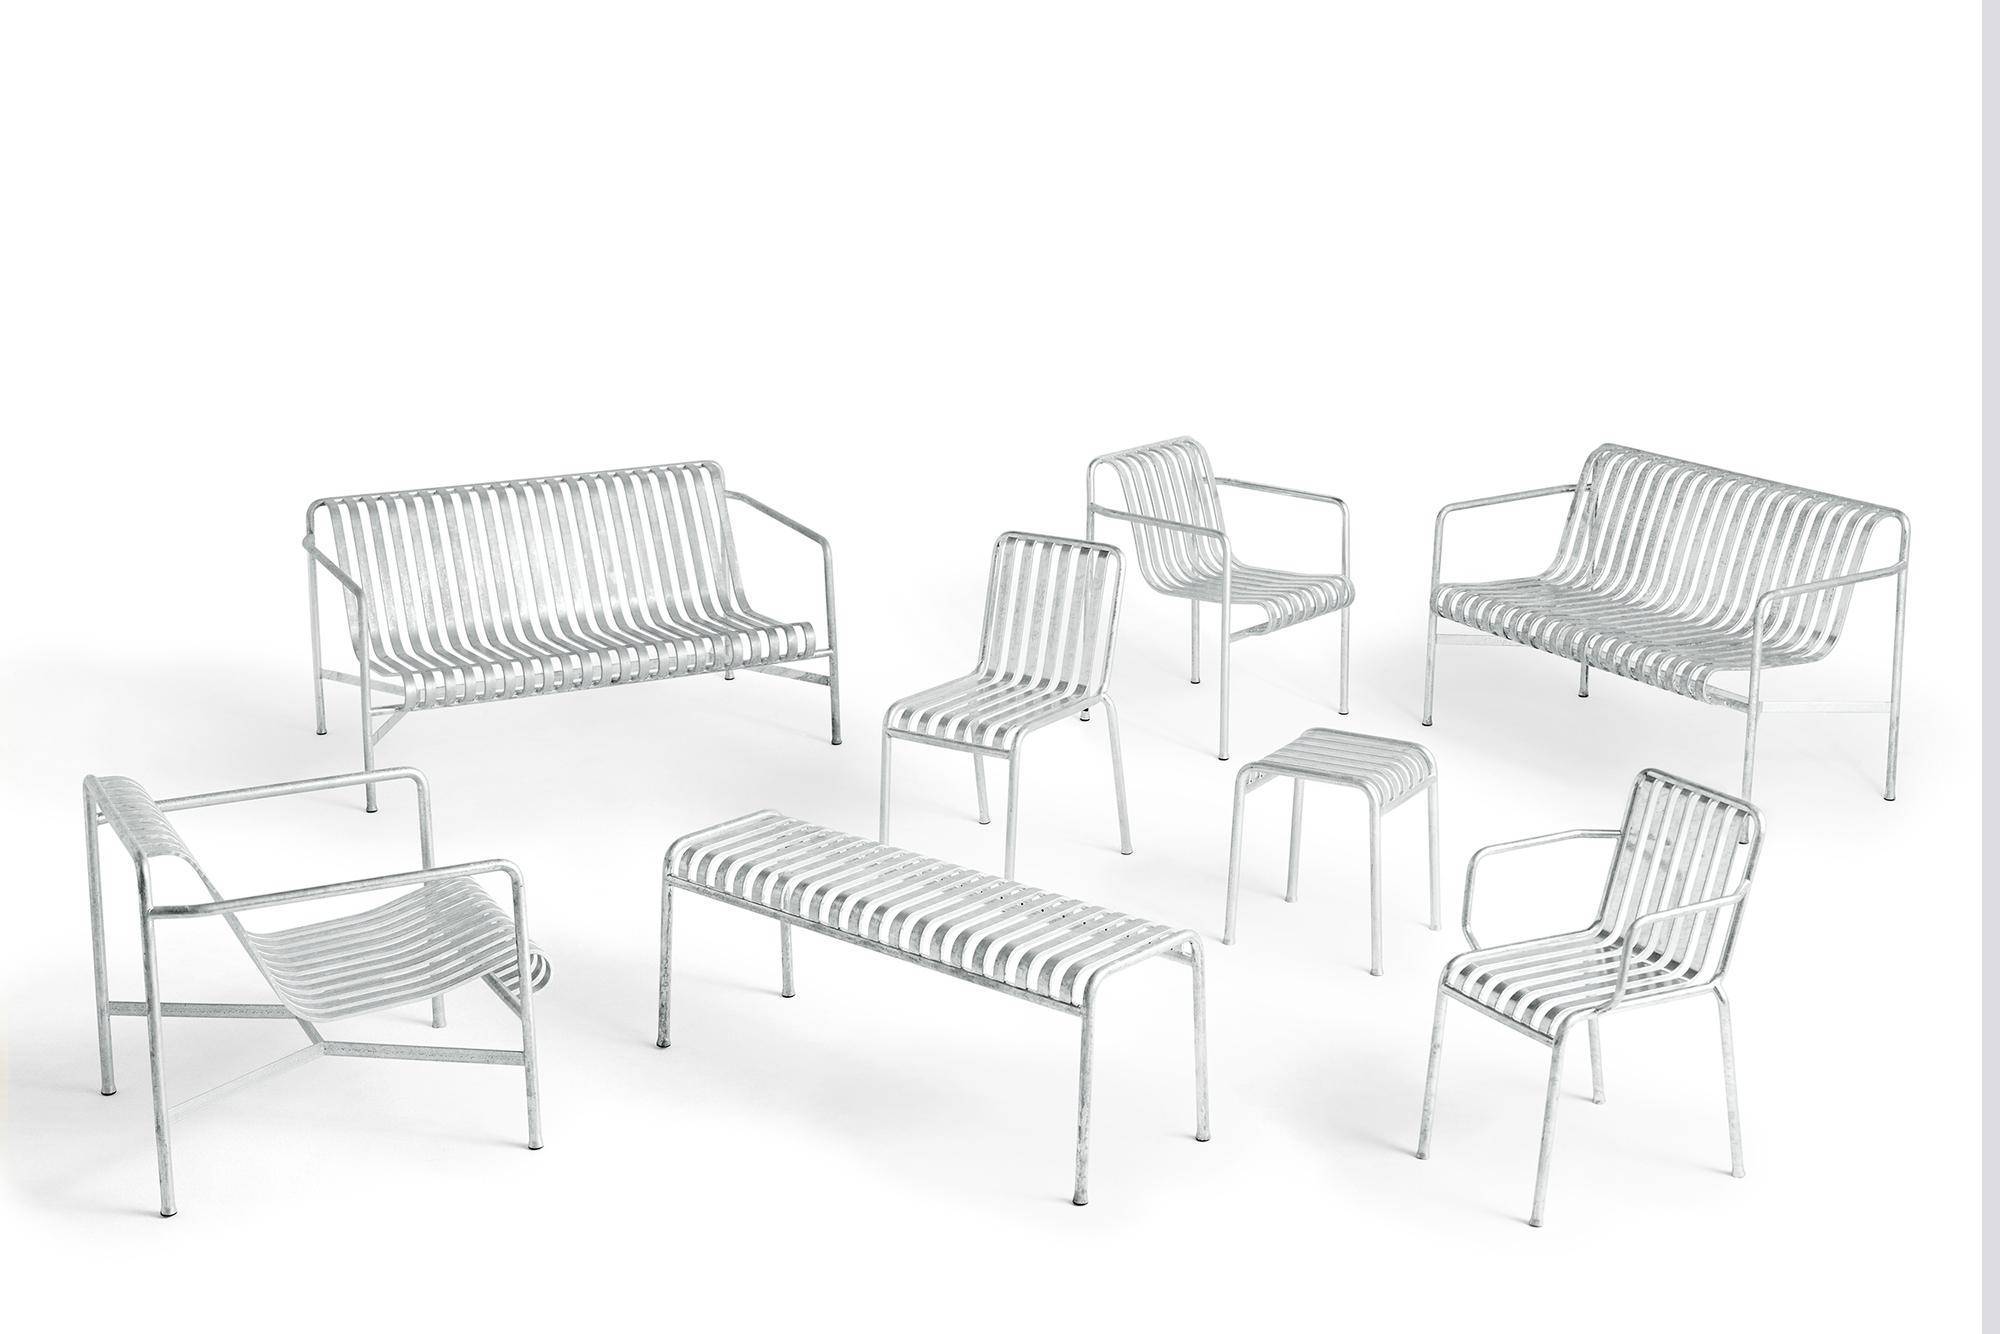 Palissade Lounge Sofa verzinkt Outdoor Hay